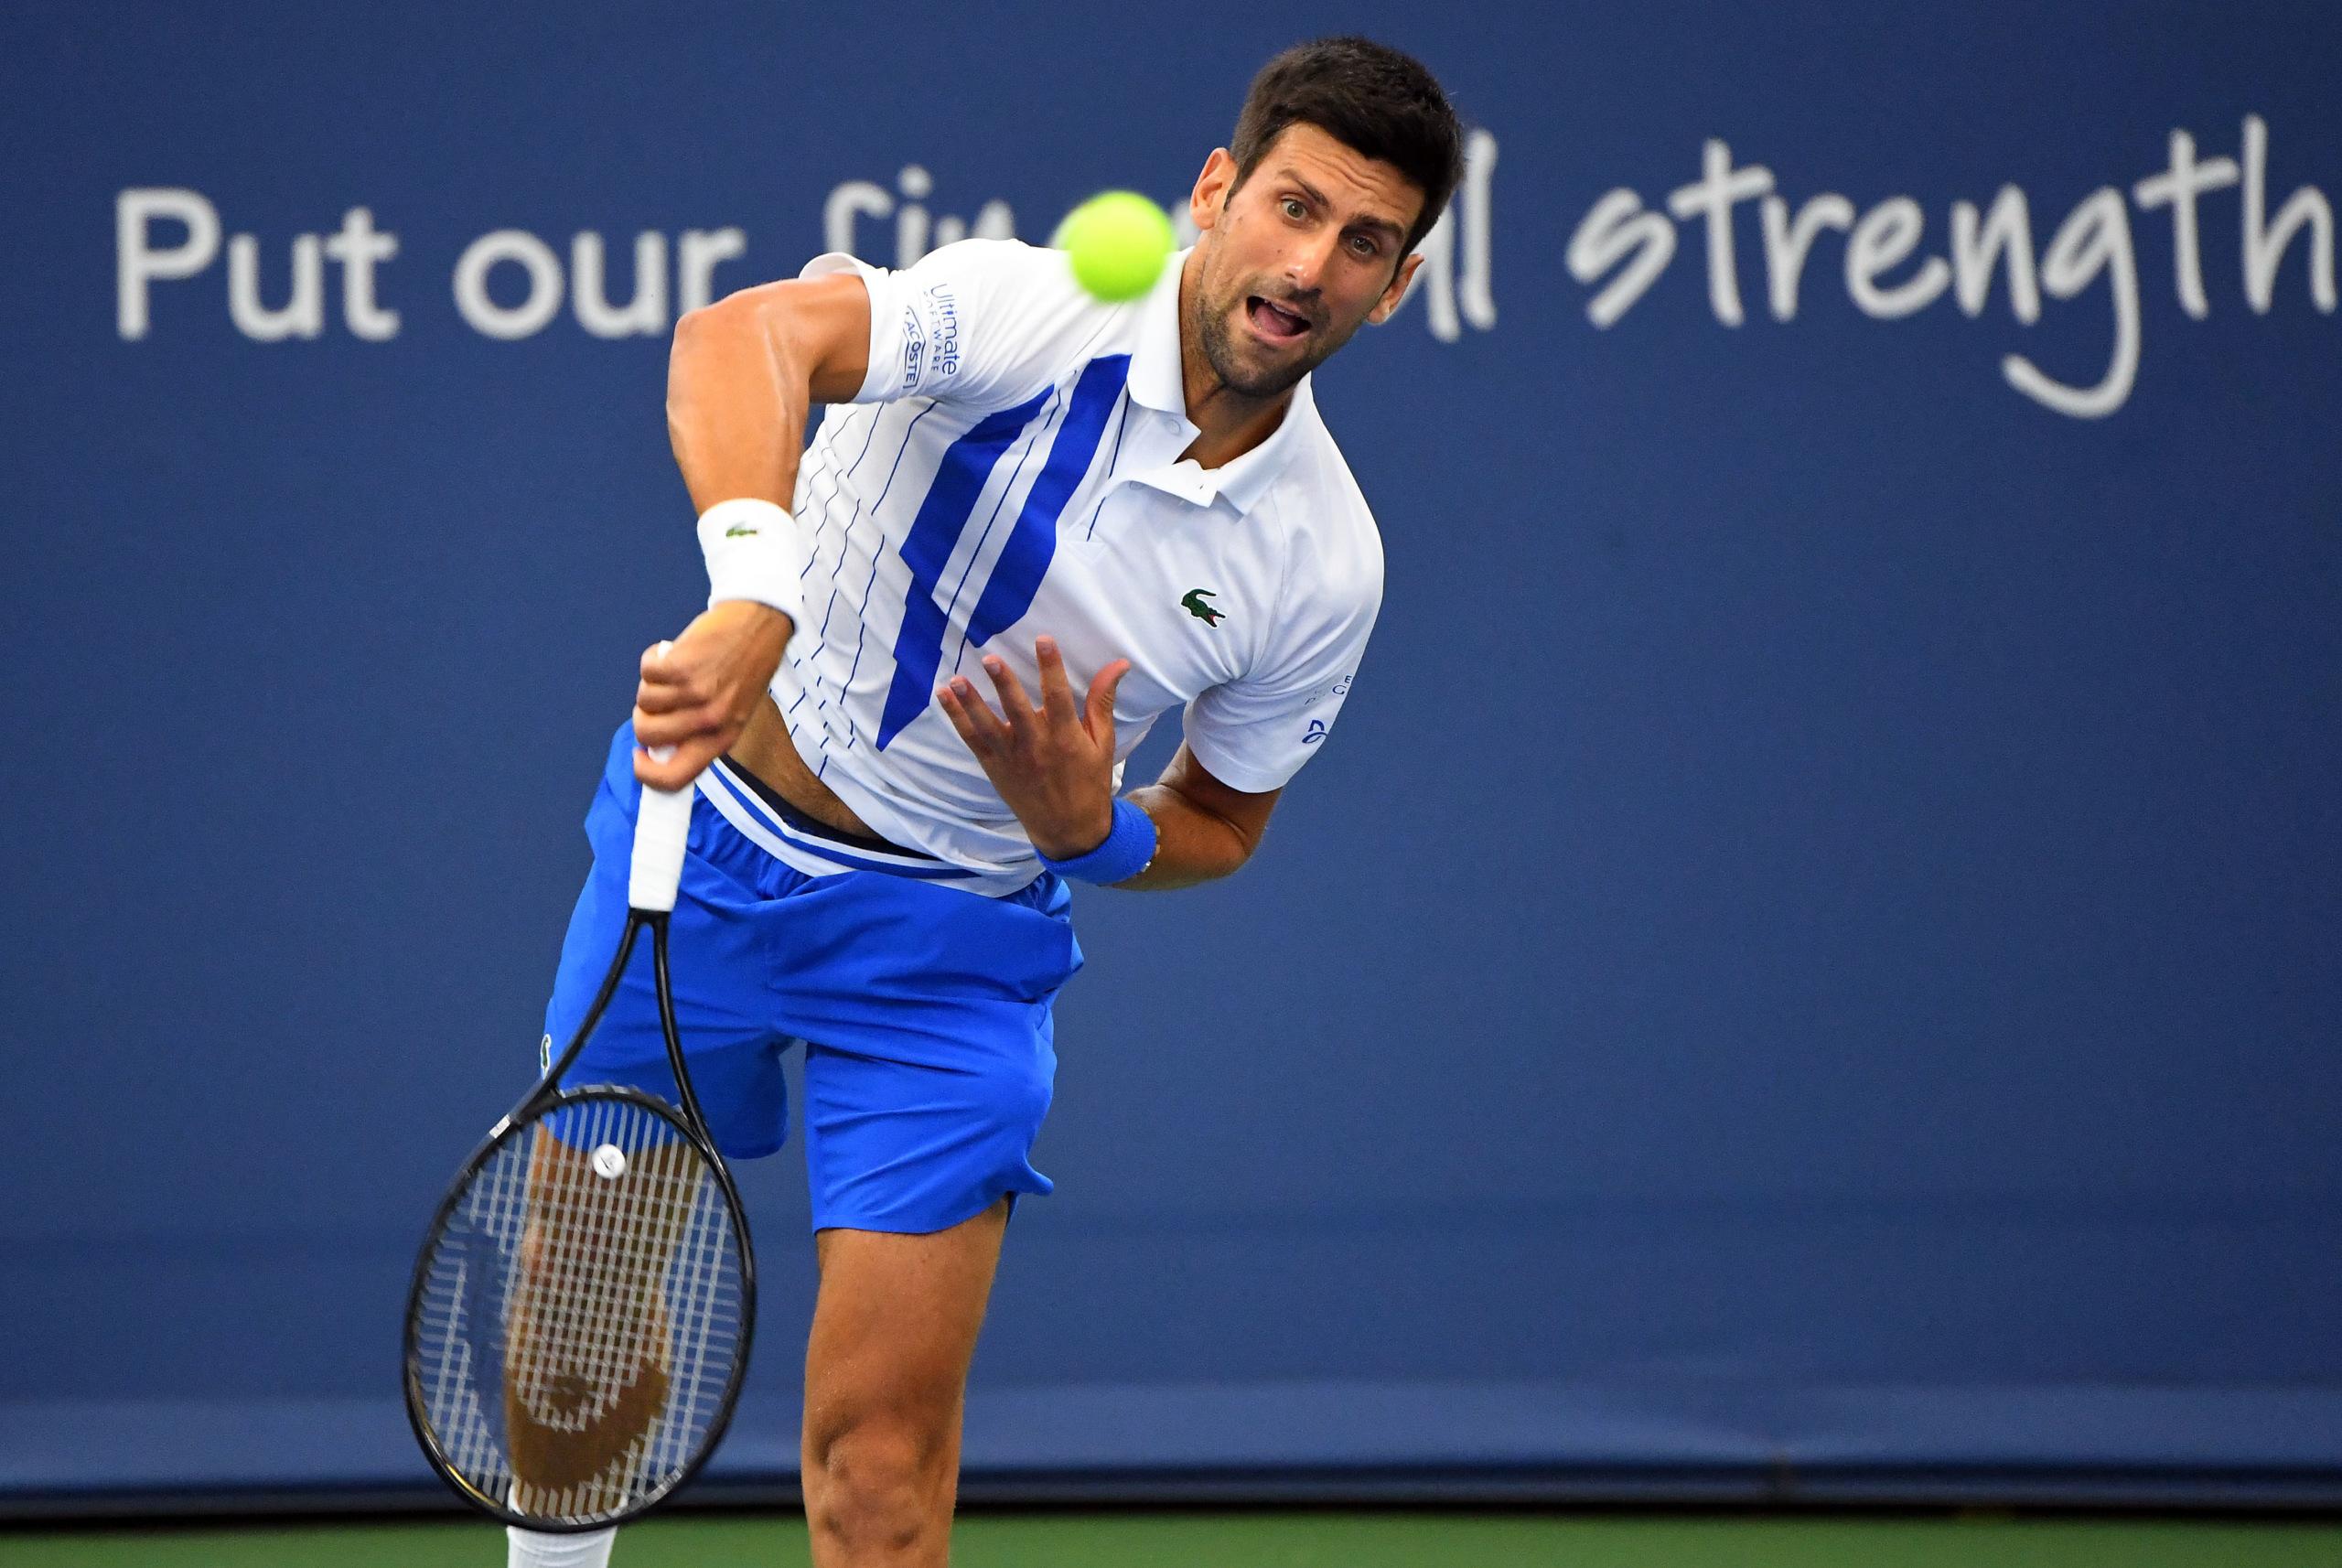 Djokovic-Led Tennis Players' Association Meets Mixed Reviews